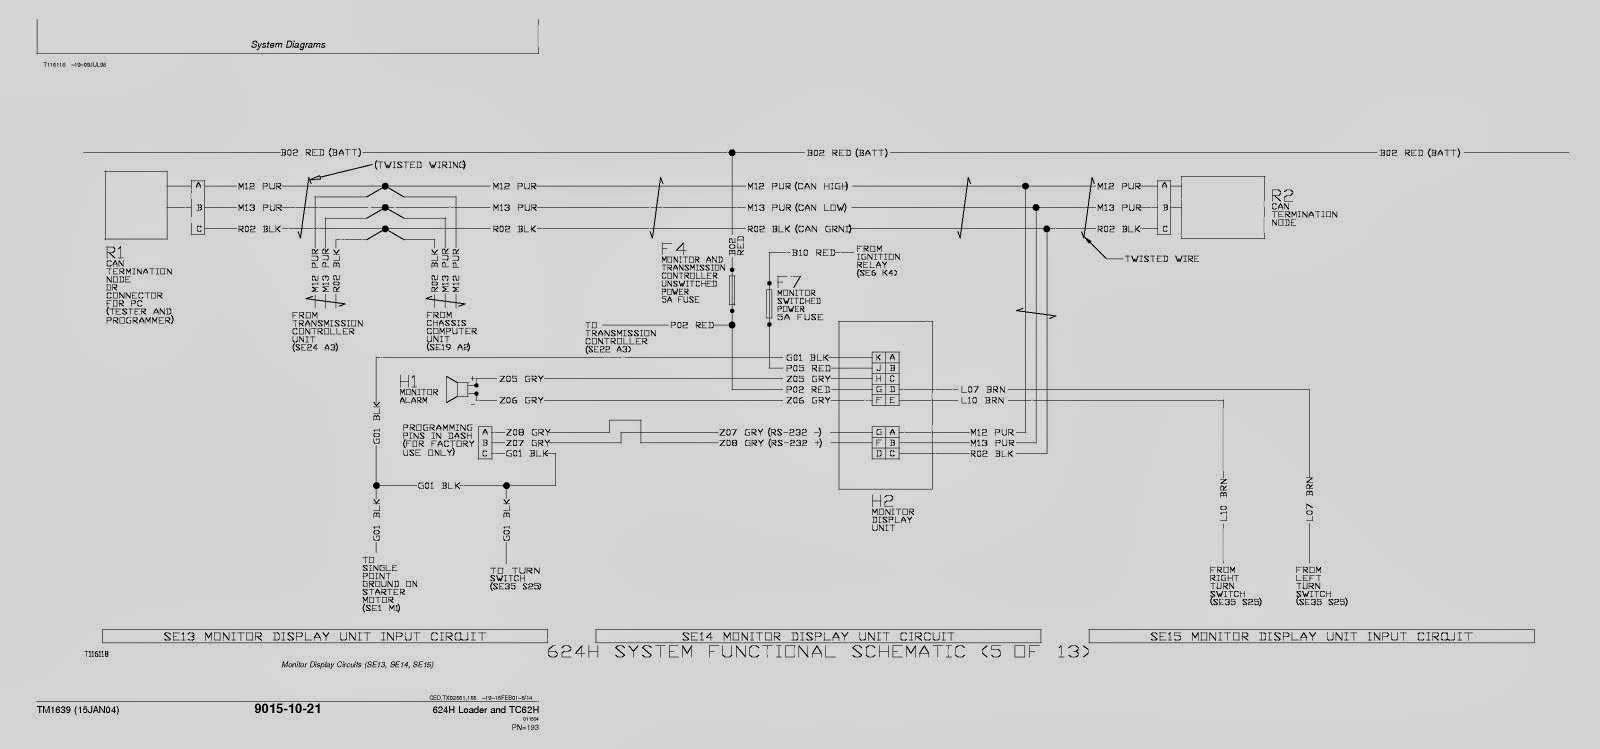 small resolution of  john owner manual john deere 3225b on john deere parts diagrams john deere solenoid wiring